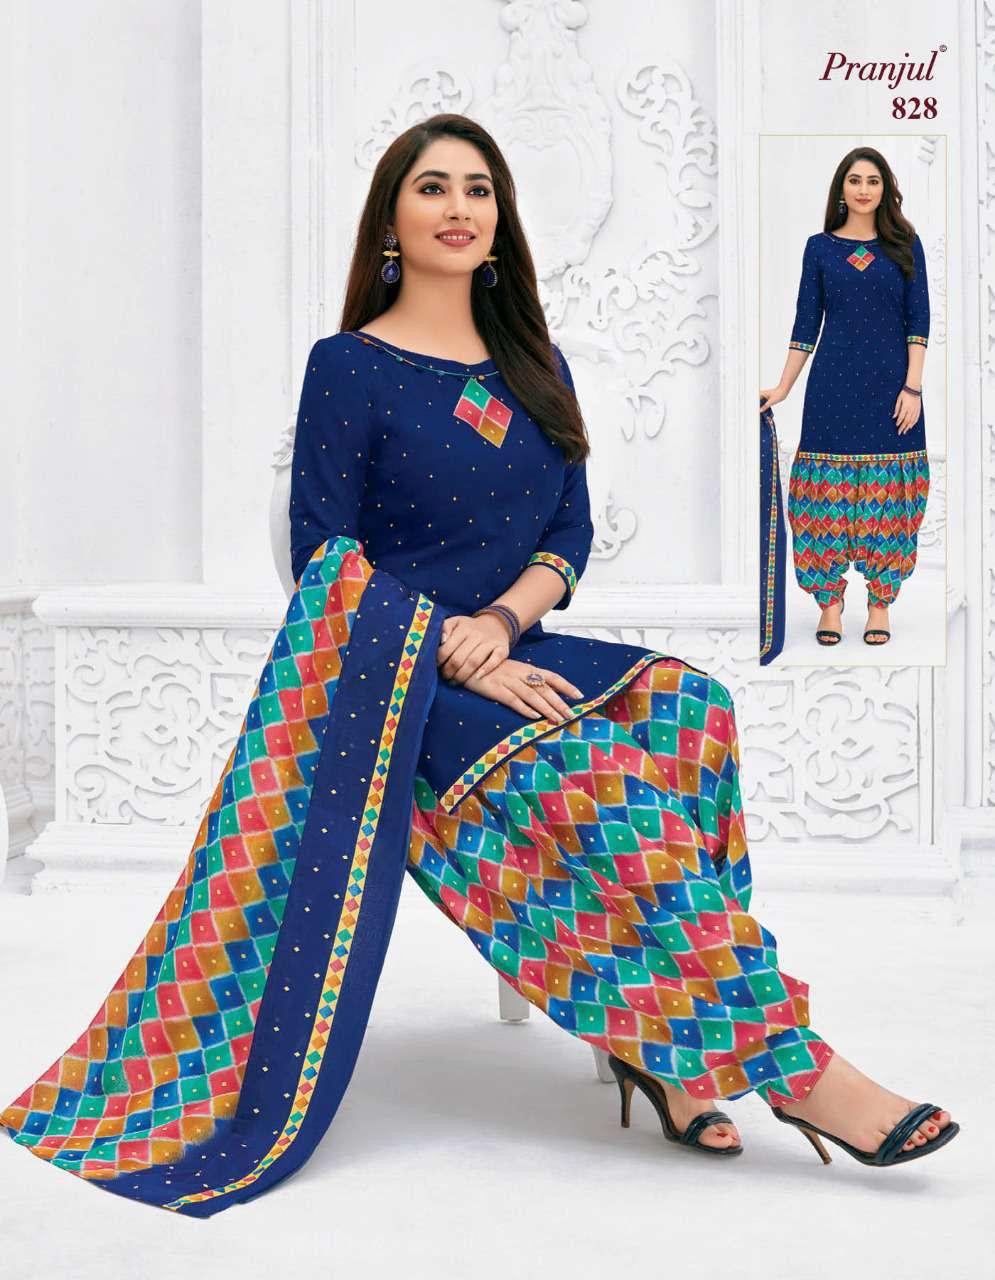 Pranjul 3XL Priyanka Vol 8 A Readymade Suit Wholesale Catalog 15 Pcs 15 - Pranjul 3XL Priyanka Vol 8 A Readymade Suit Wholesale Catalog 15 Pcs